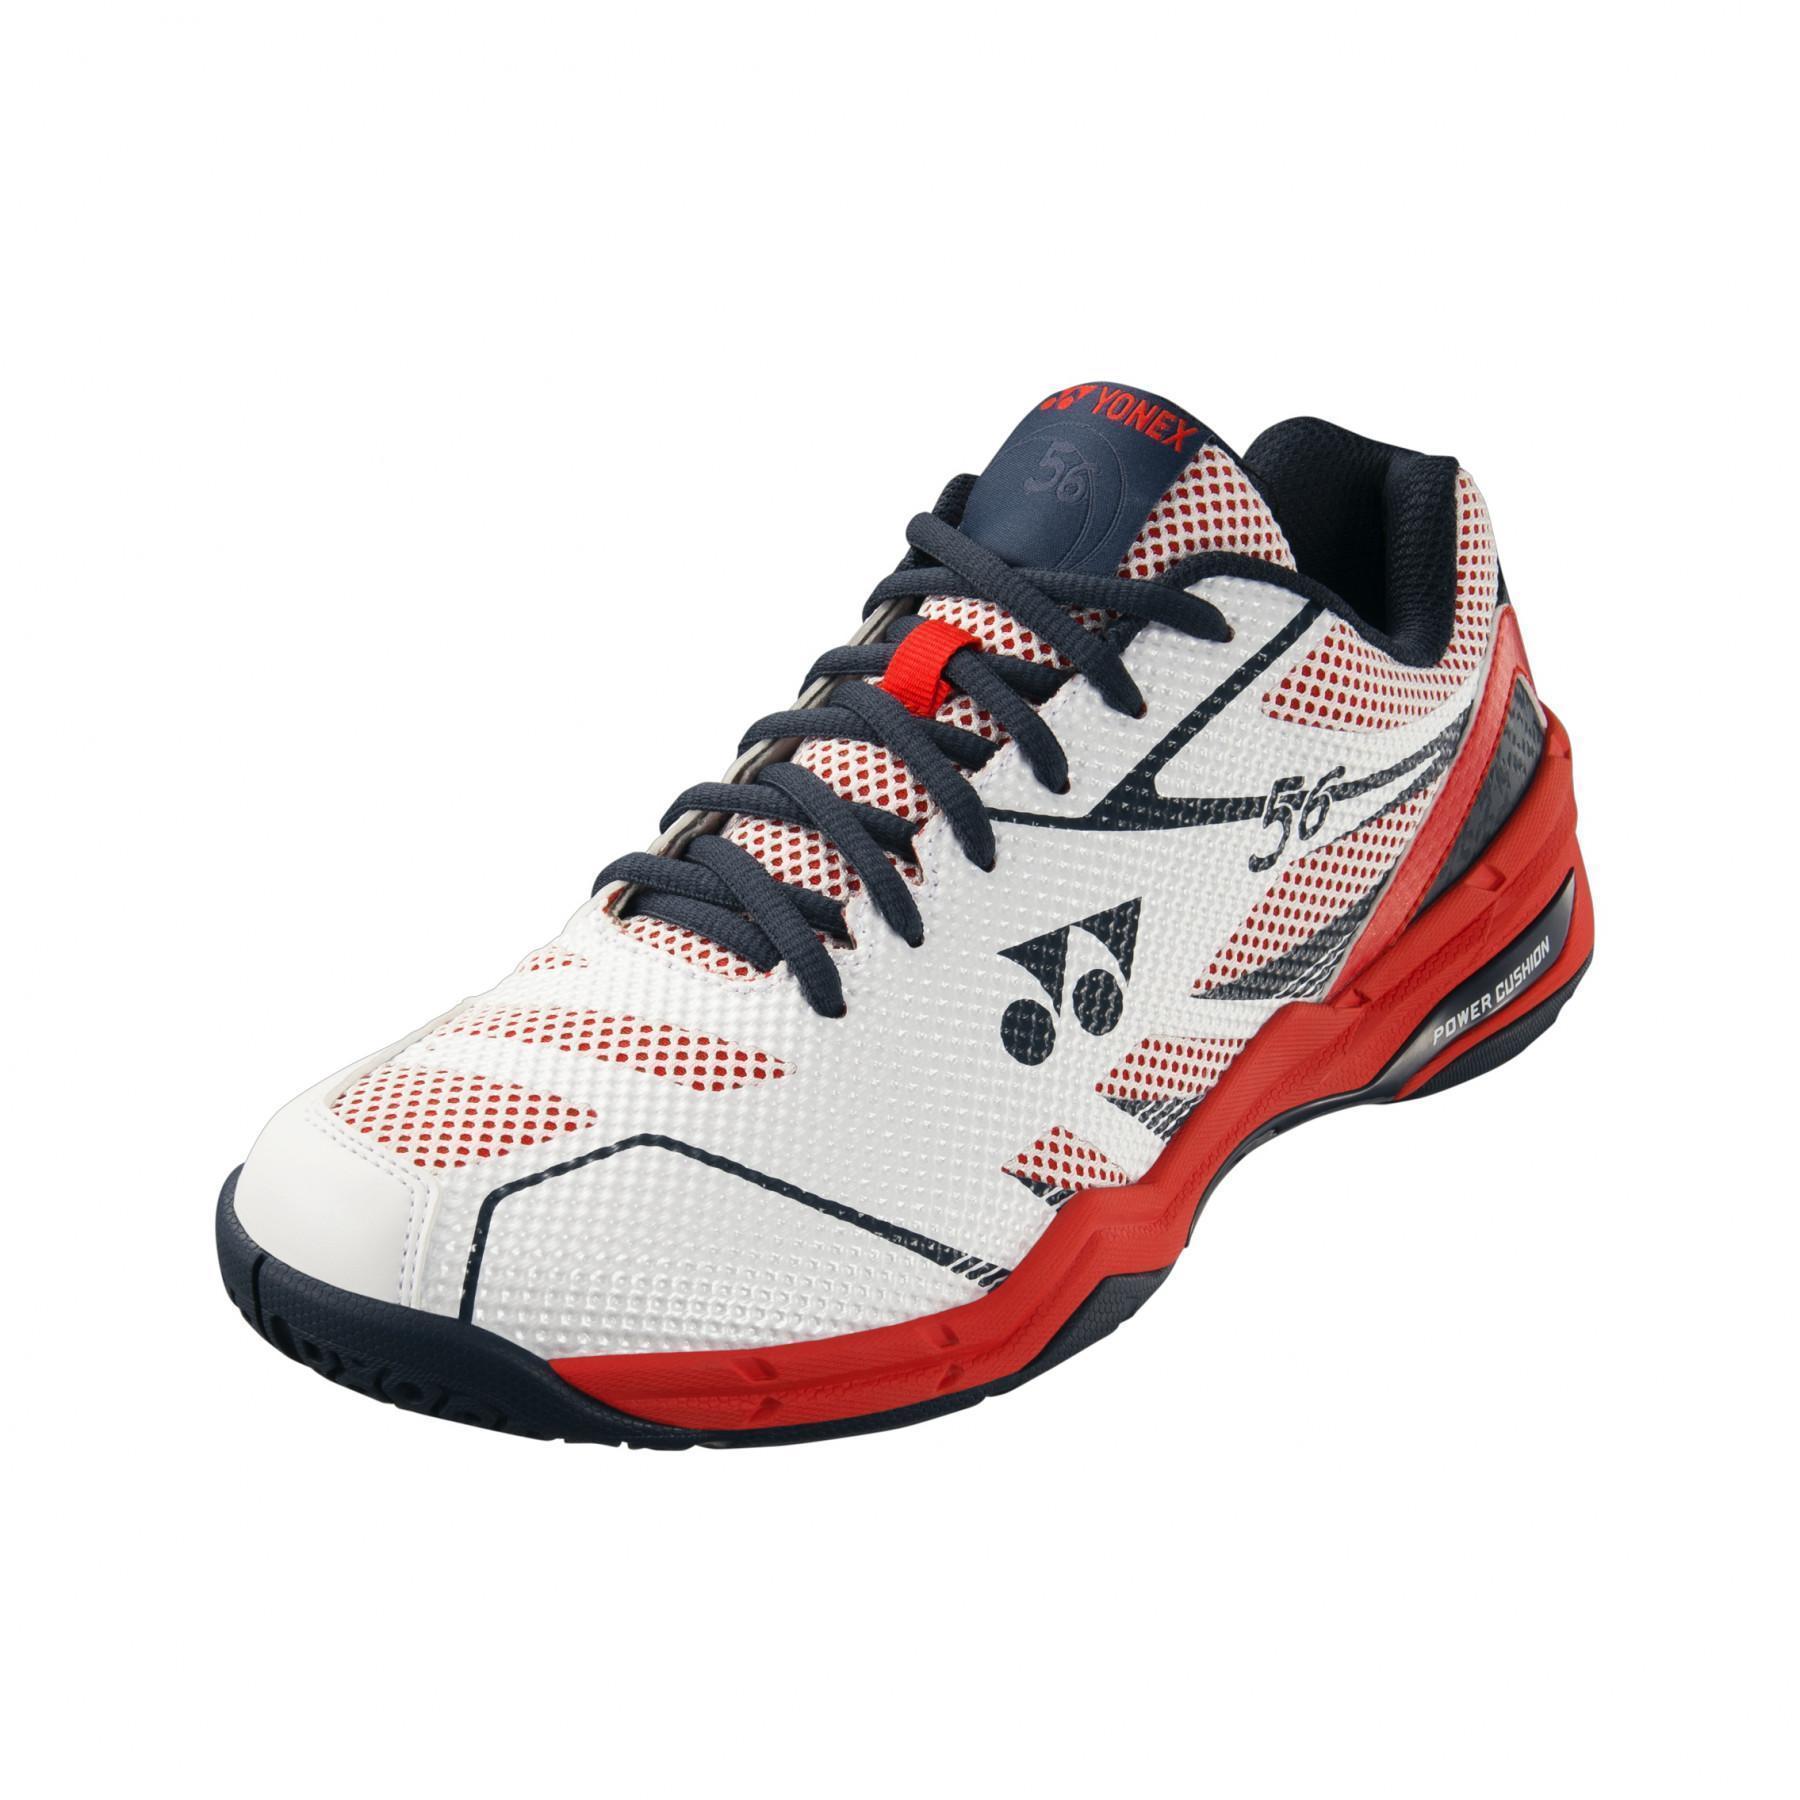 Shoes Yonex power cushion 56